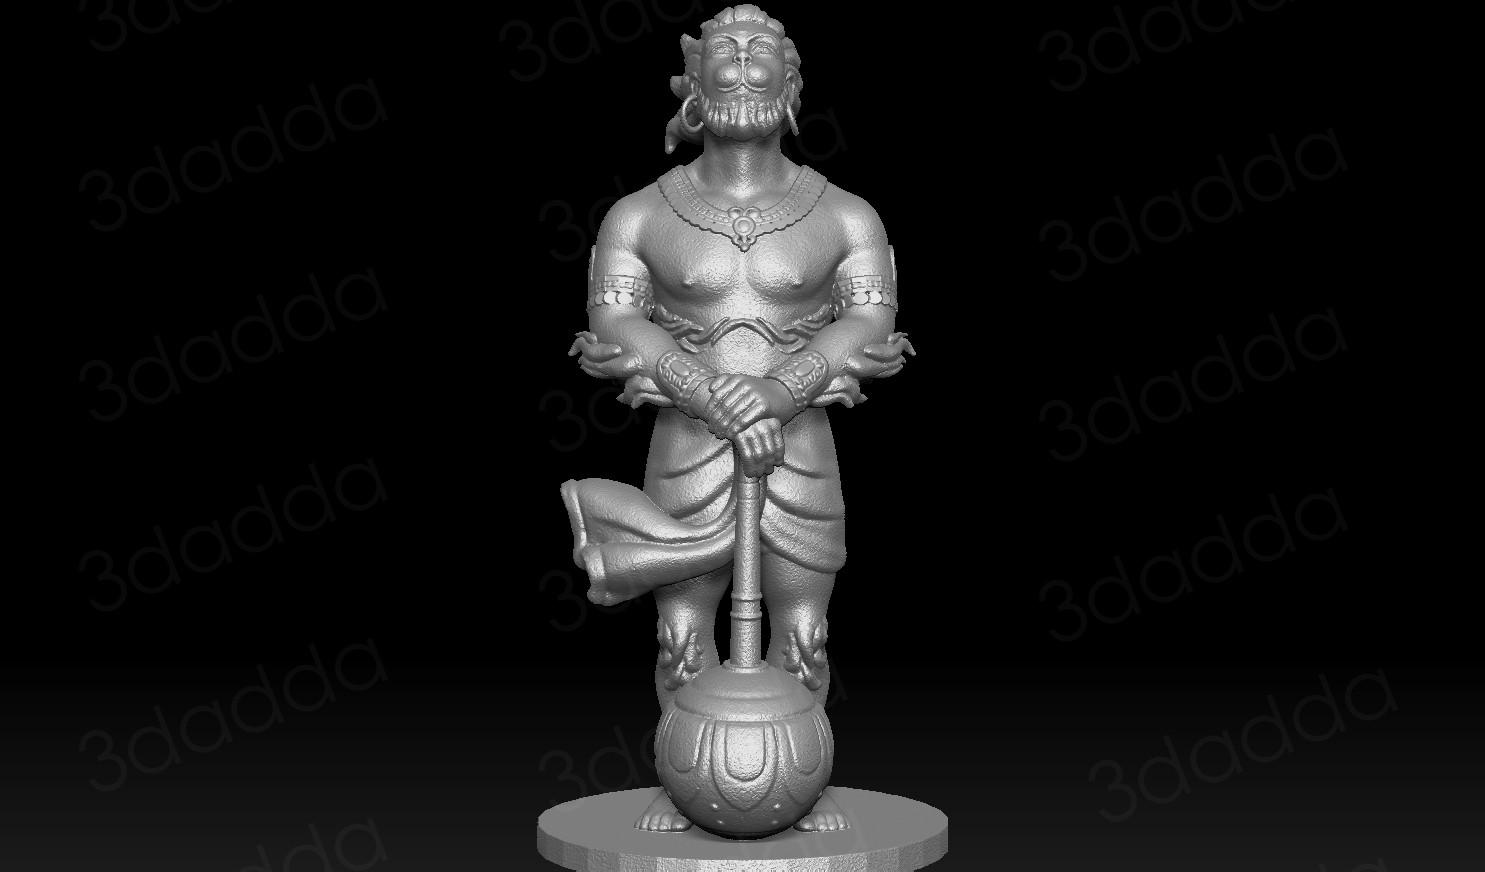 vicky kapure hanuman 3d model for 3d printing